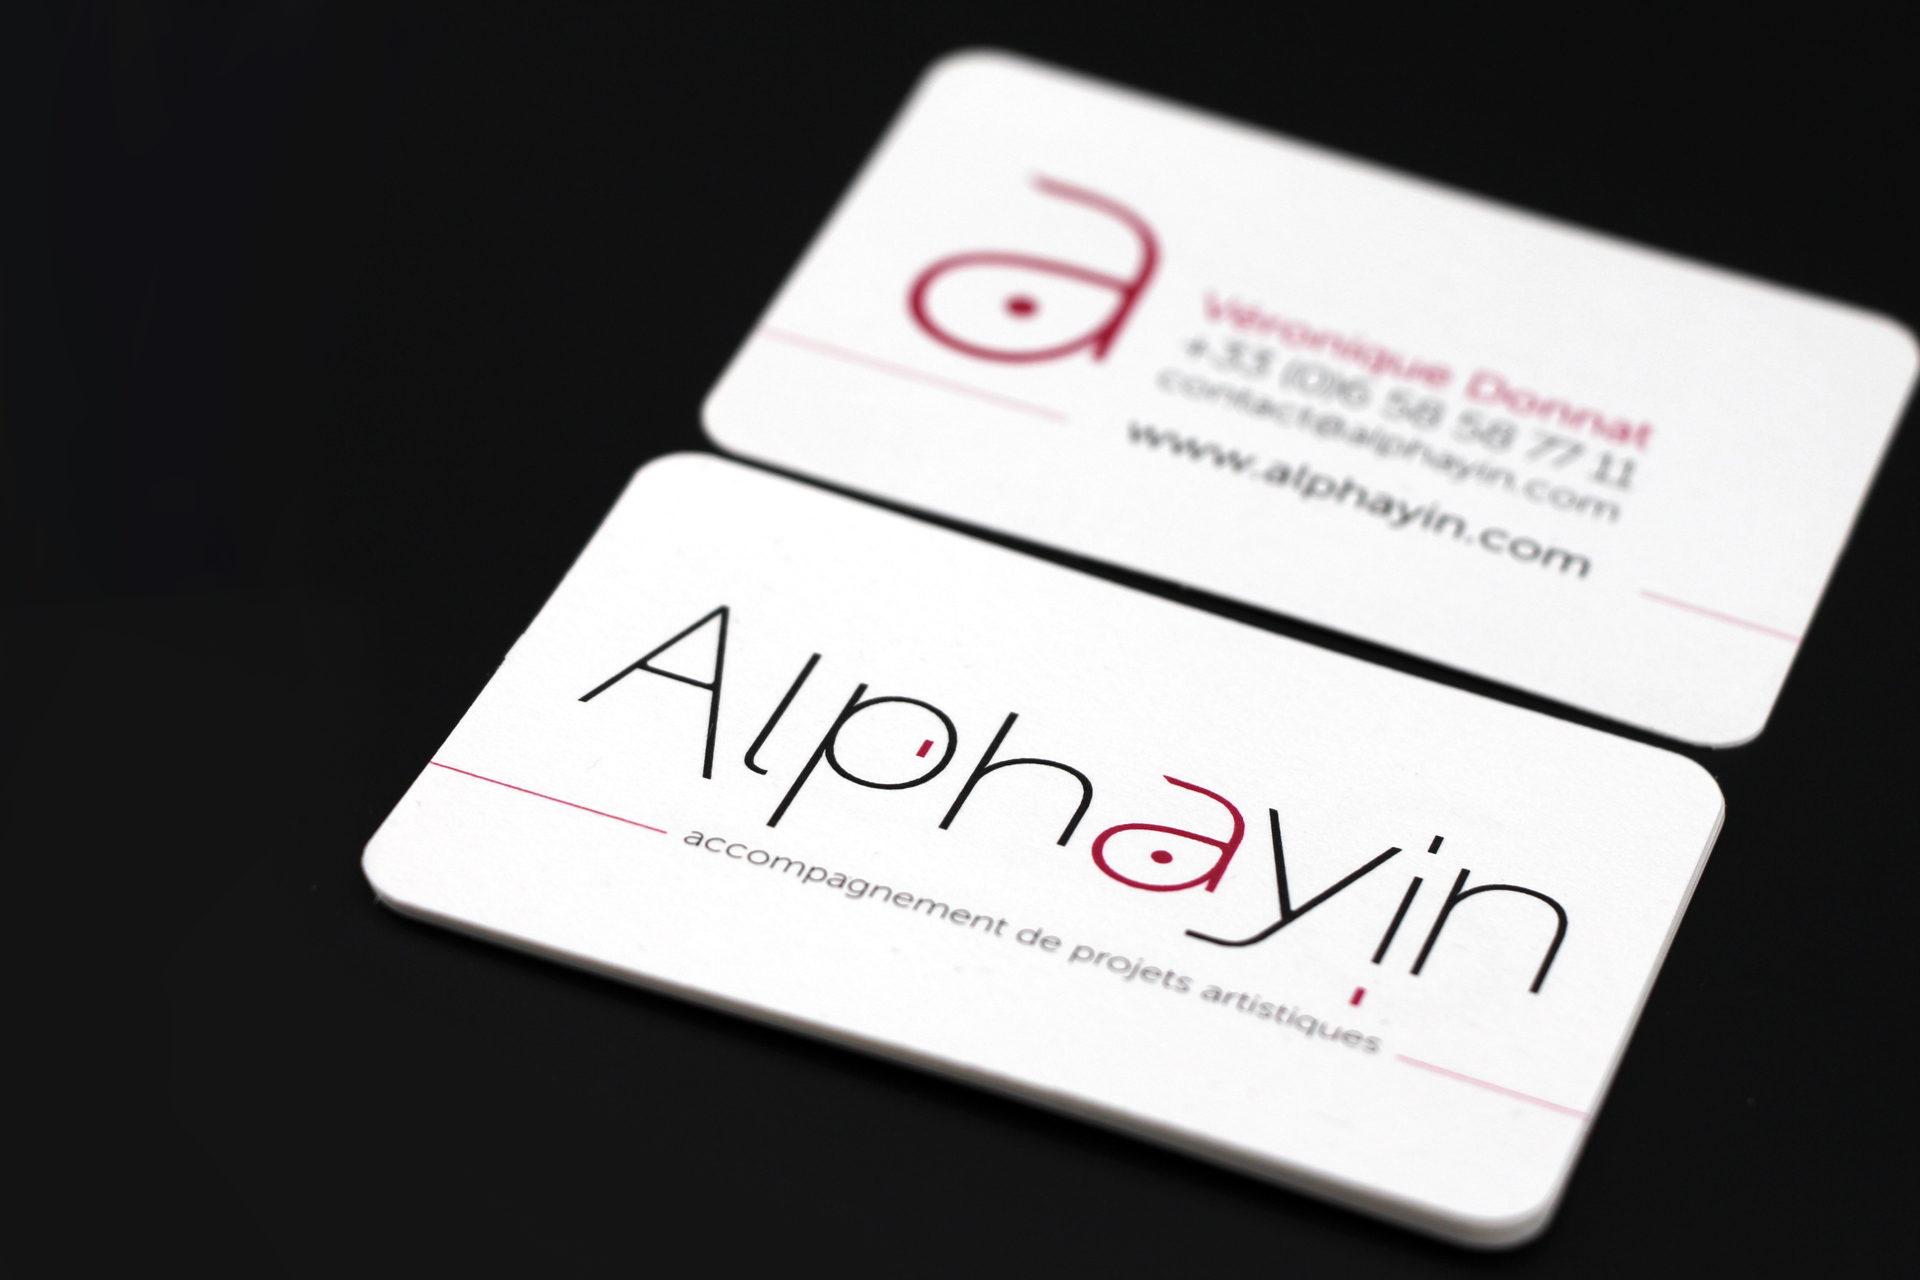 Alphayin